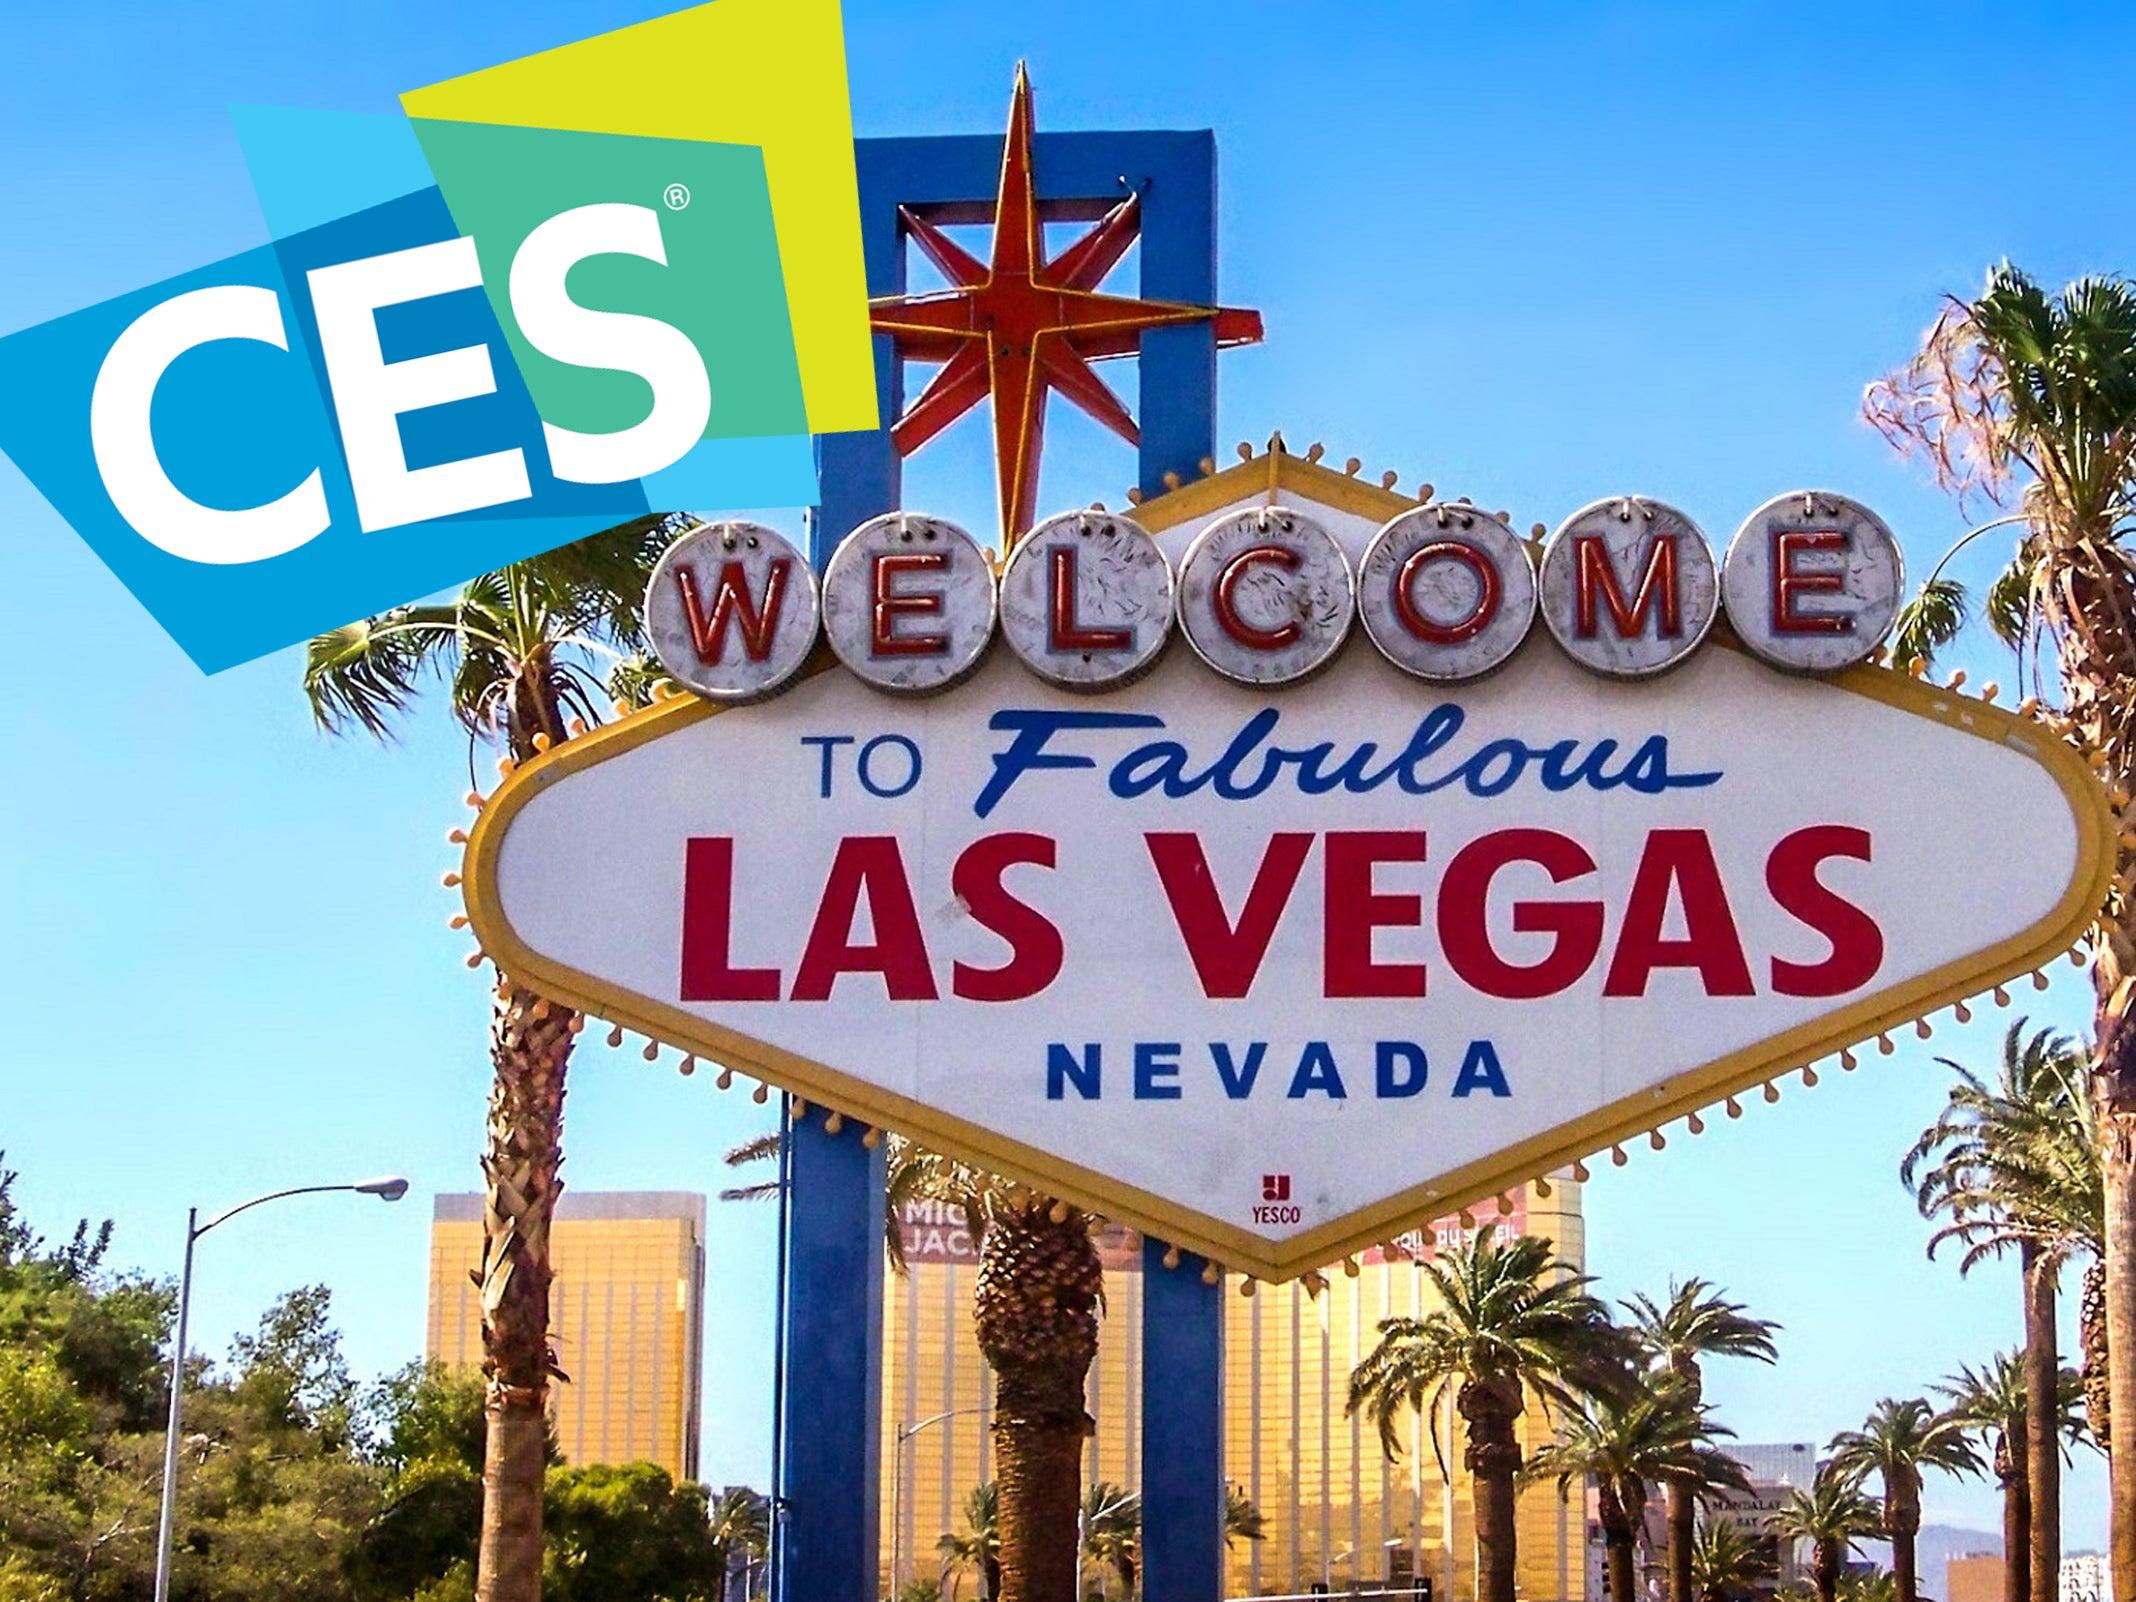 CES-Logo neben dem berühmten Las-Vegas-Willkommen-Schild